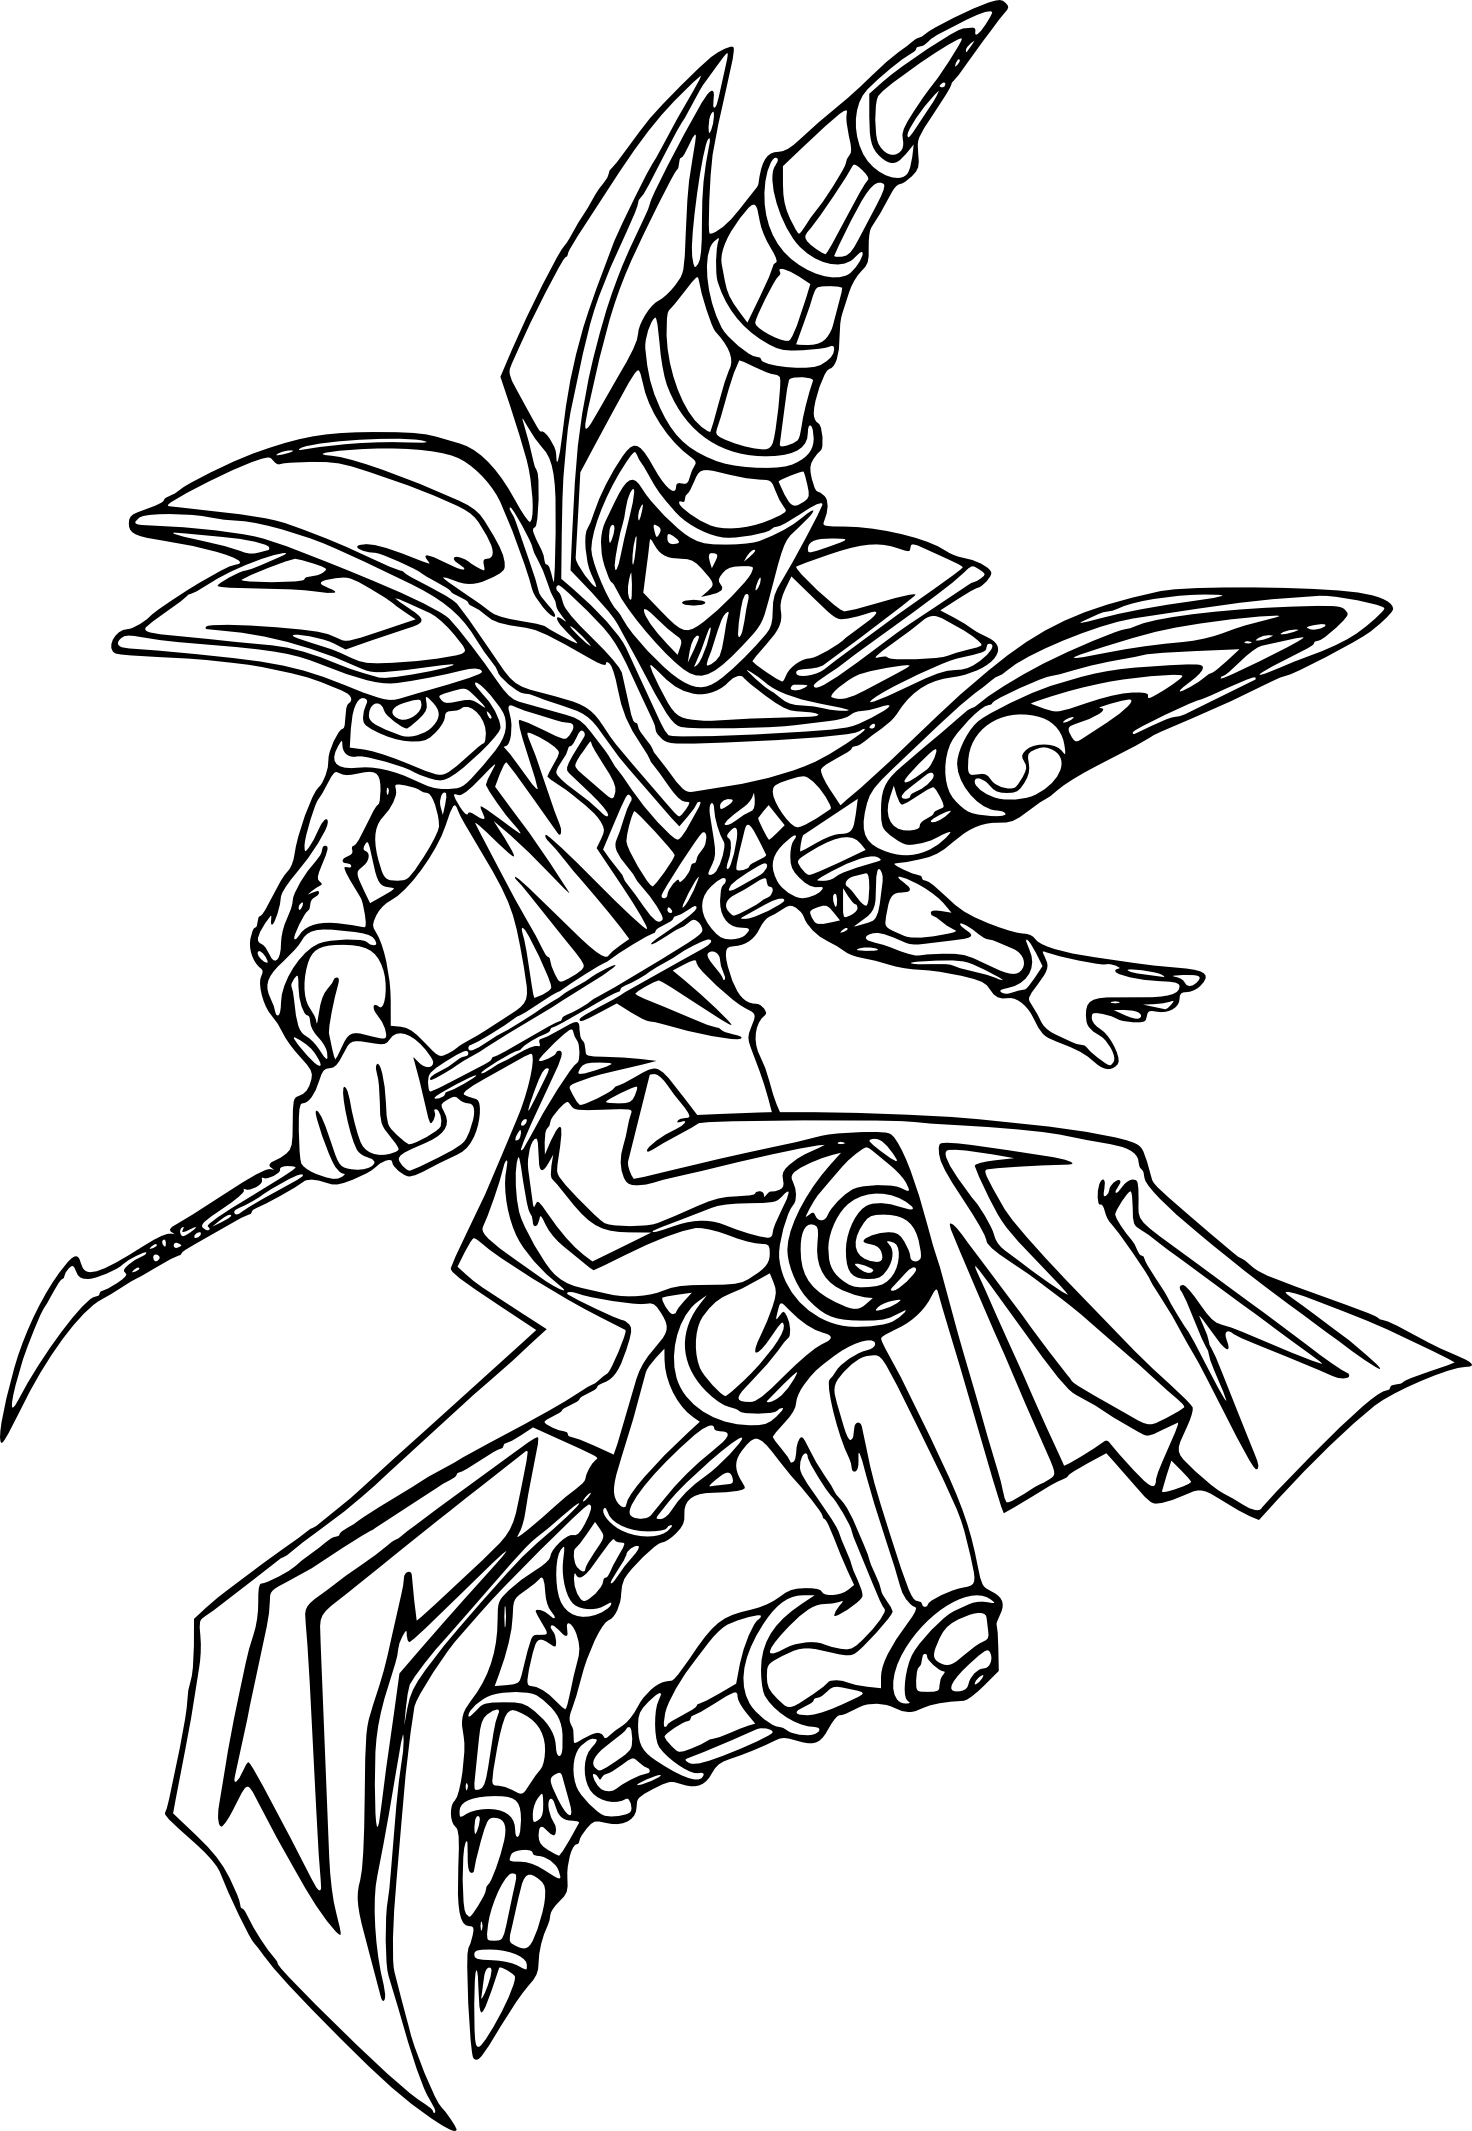 Coloriage Chevalier Yu Gi Oh A Imprimer